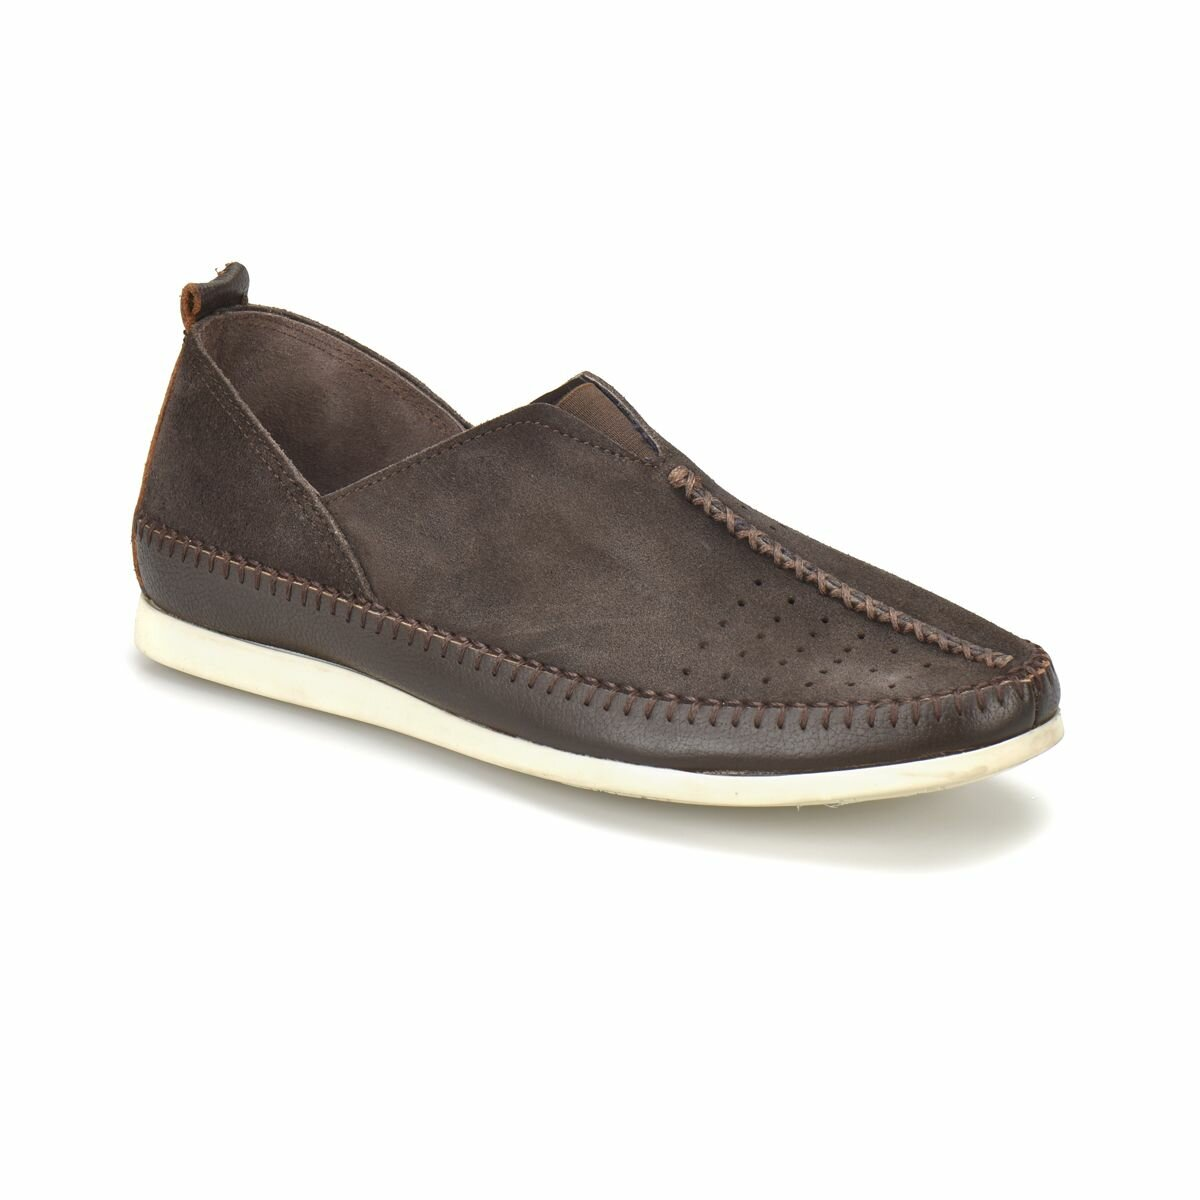 FLO 324 M 1492 Brown Men 'S Modern Shoes Flogart